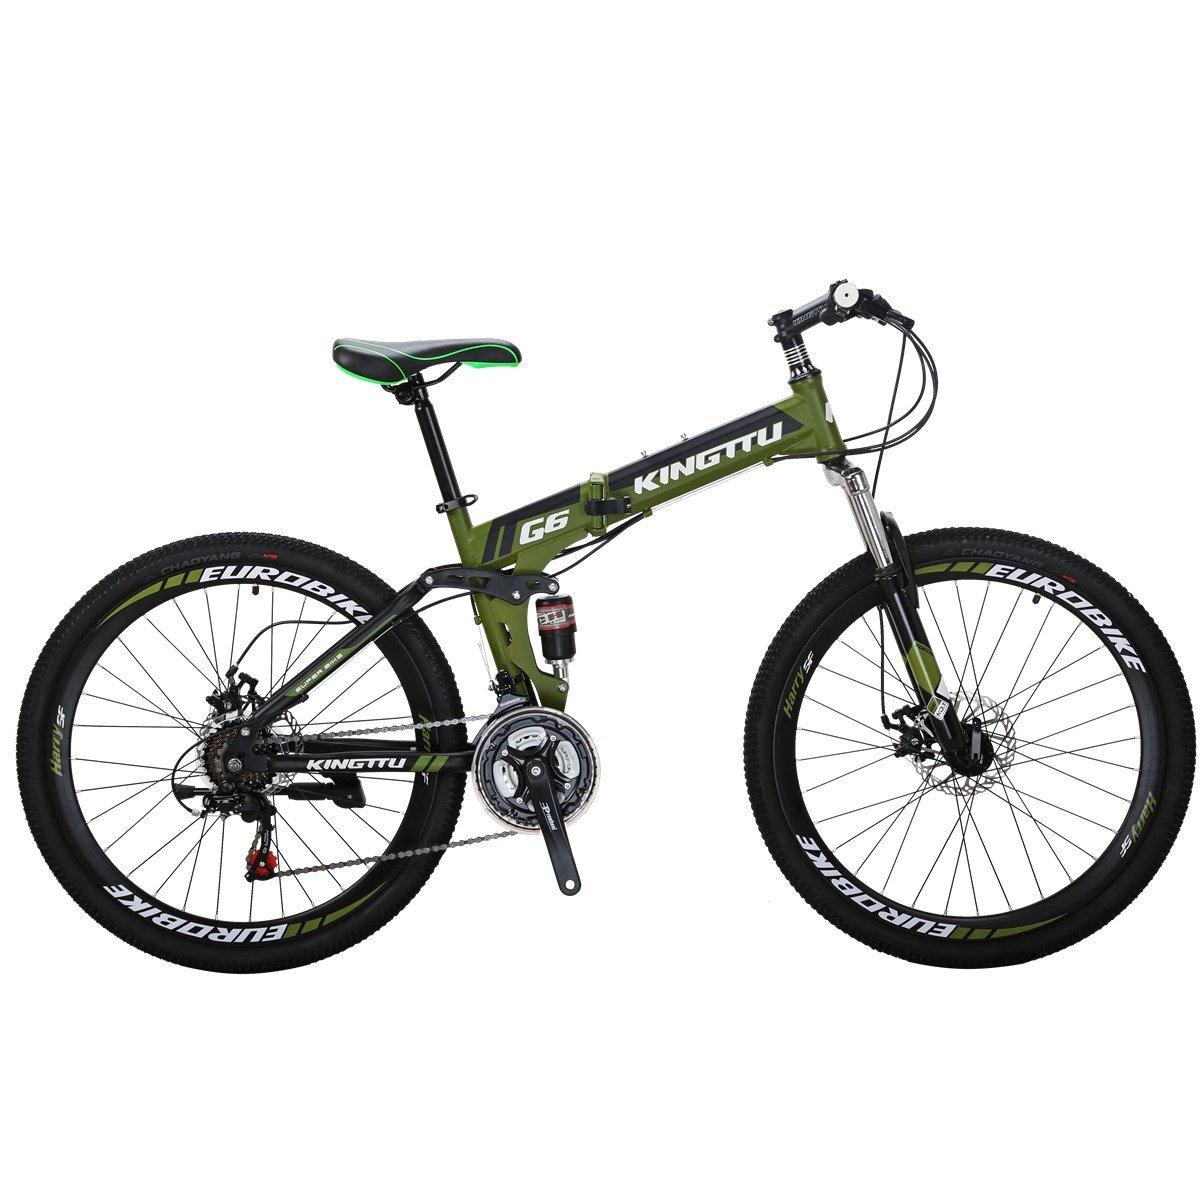 eurobike mountain bike g6 26 u0026quot  21 speed folding bike